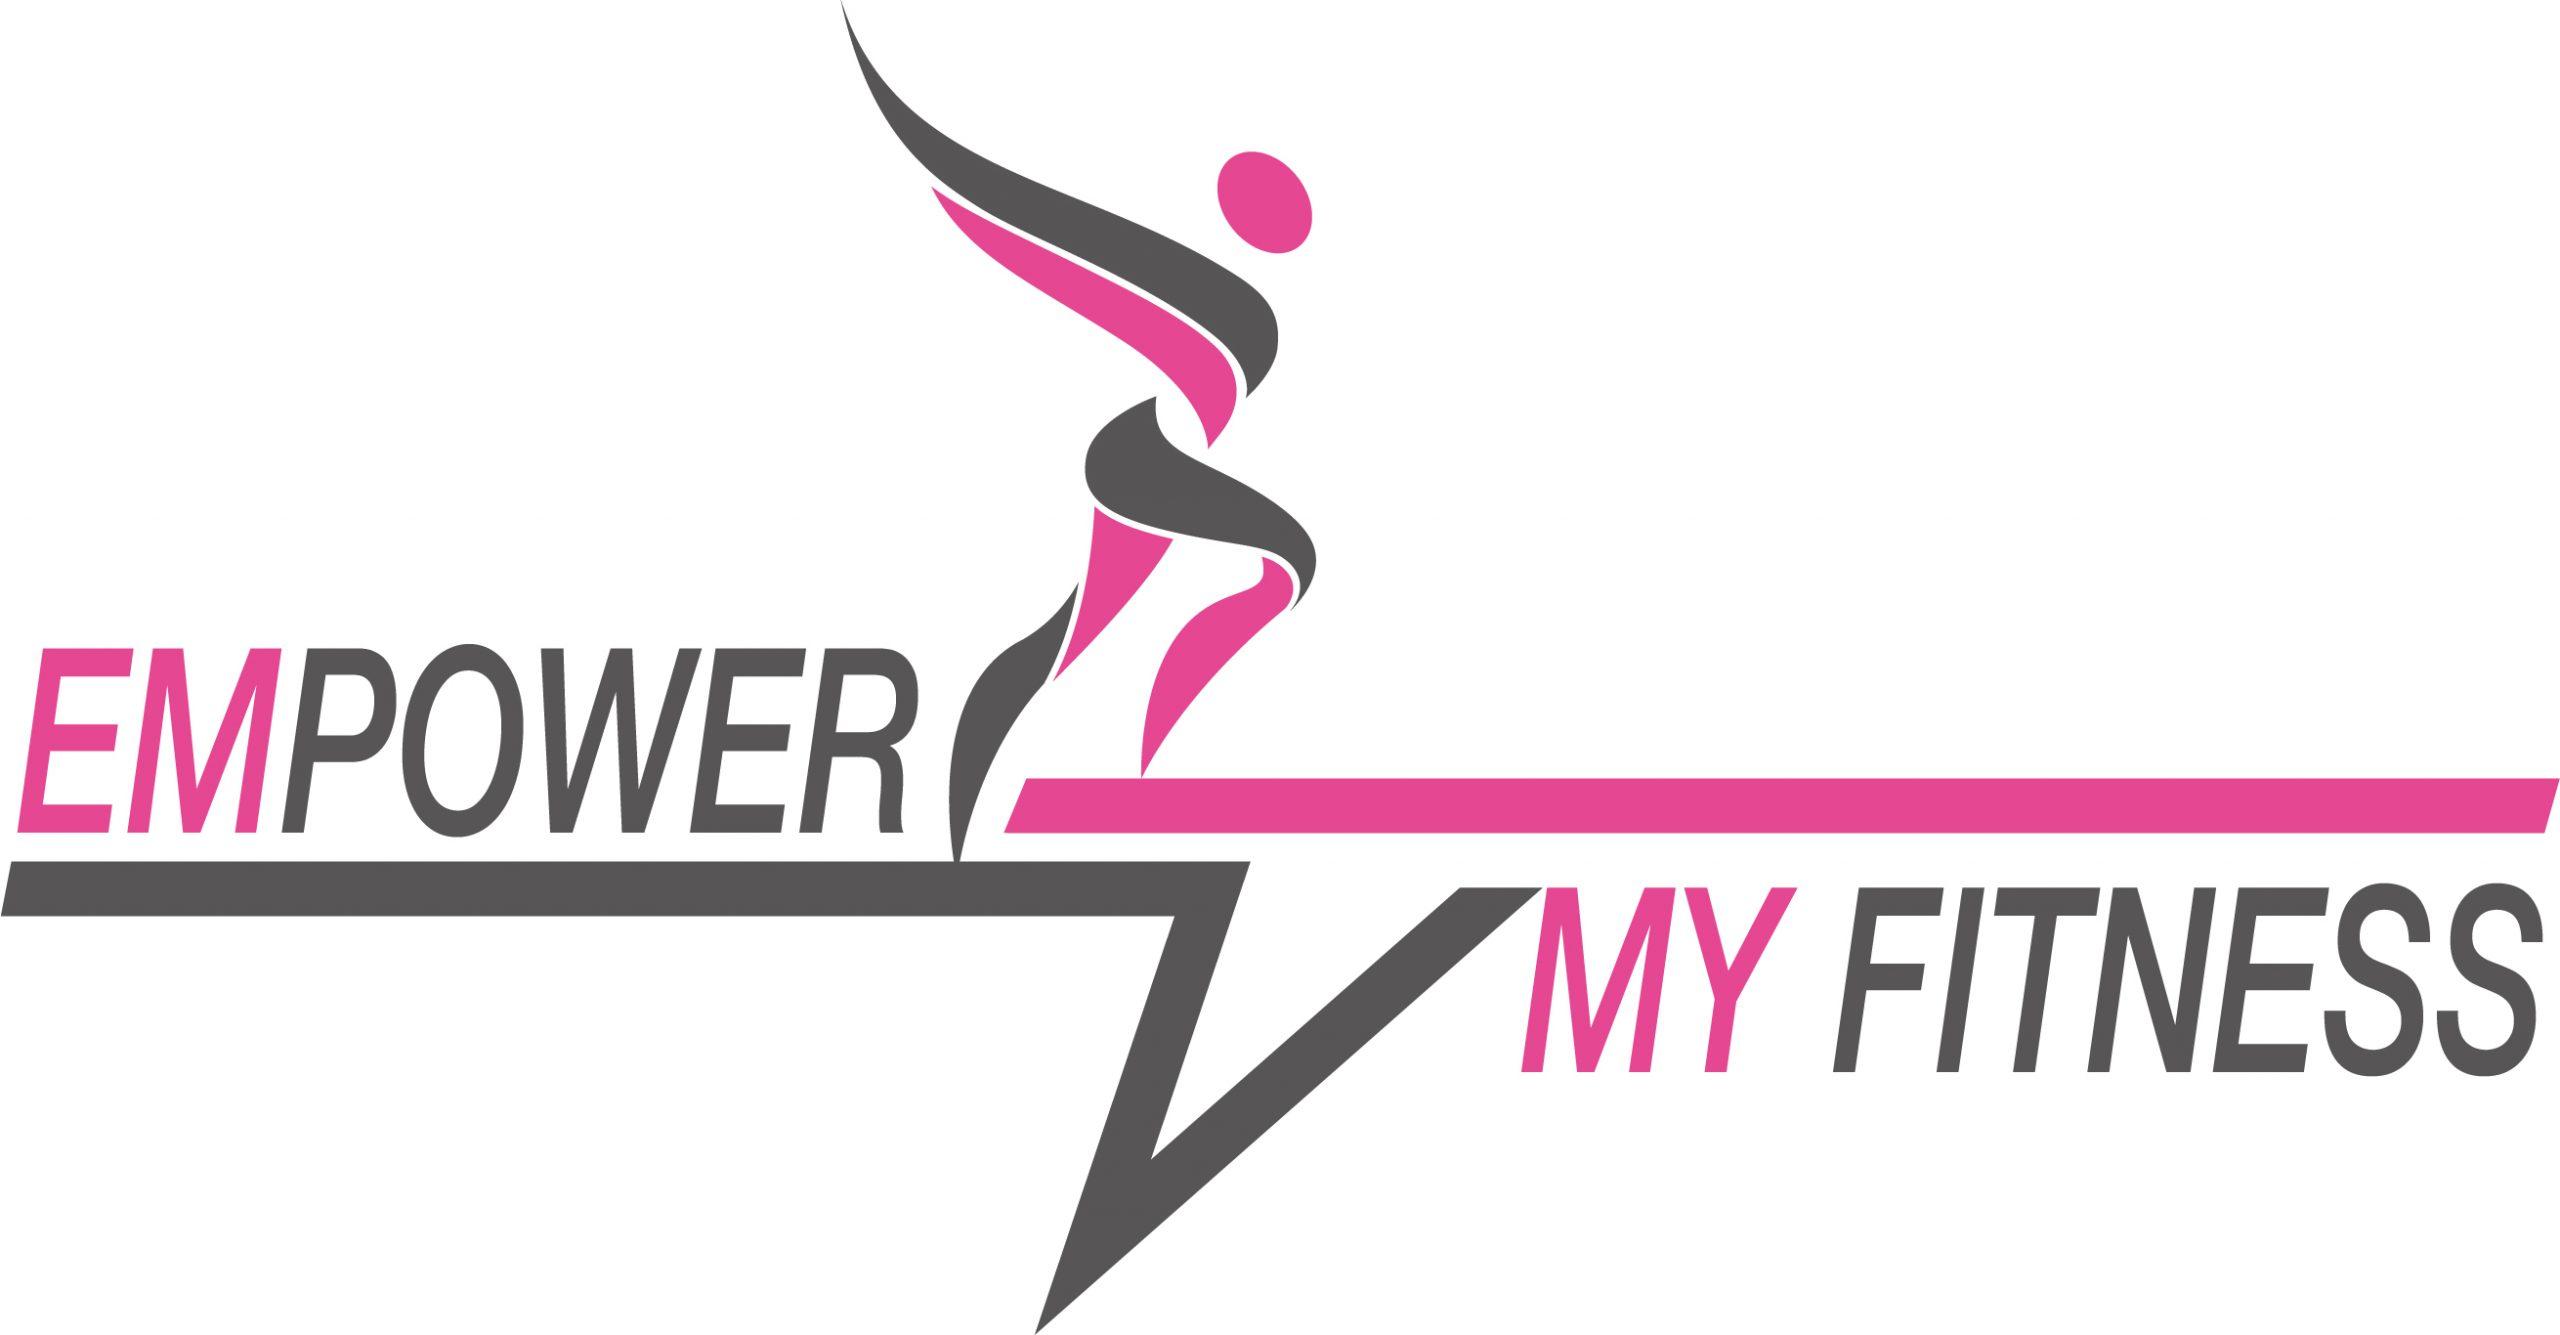 Empower My Fitness logo